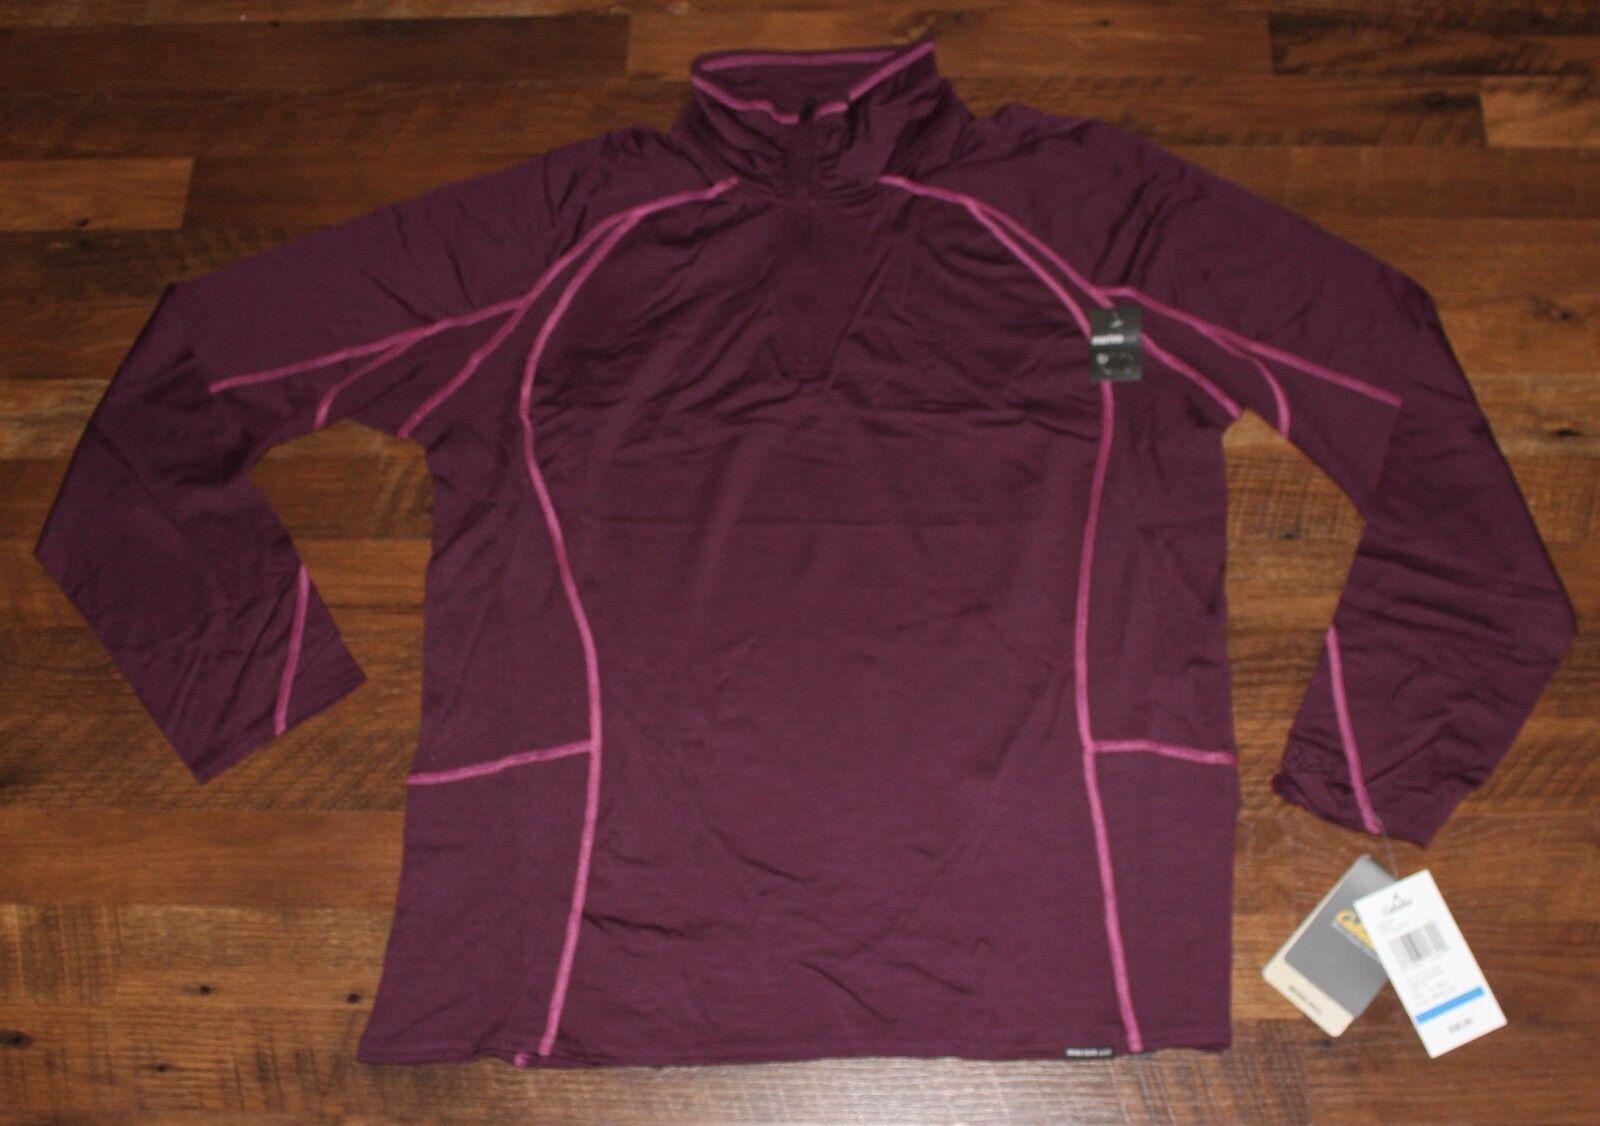 99 New CABELAS Ultimate Lightweight Merino  Wool Quarter Zip Top XL Womens Plum  a lot of concessions